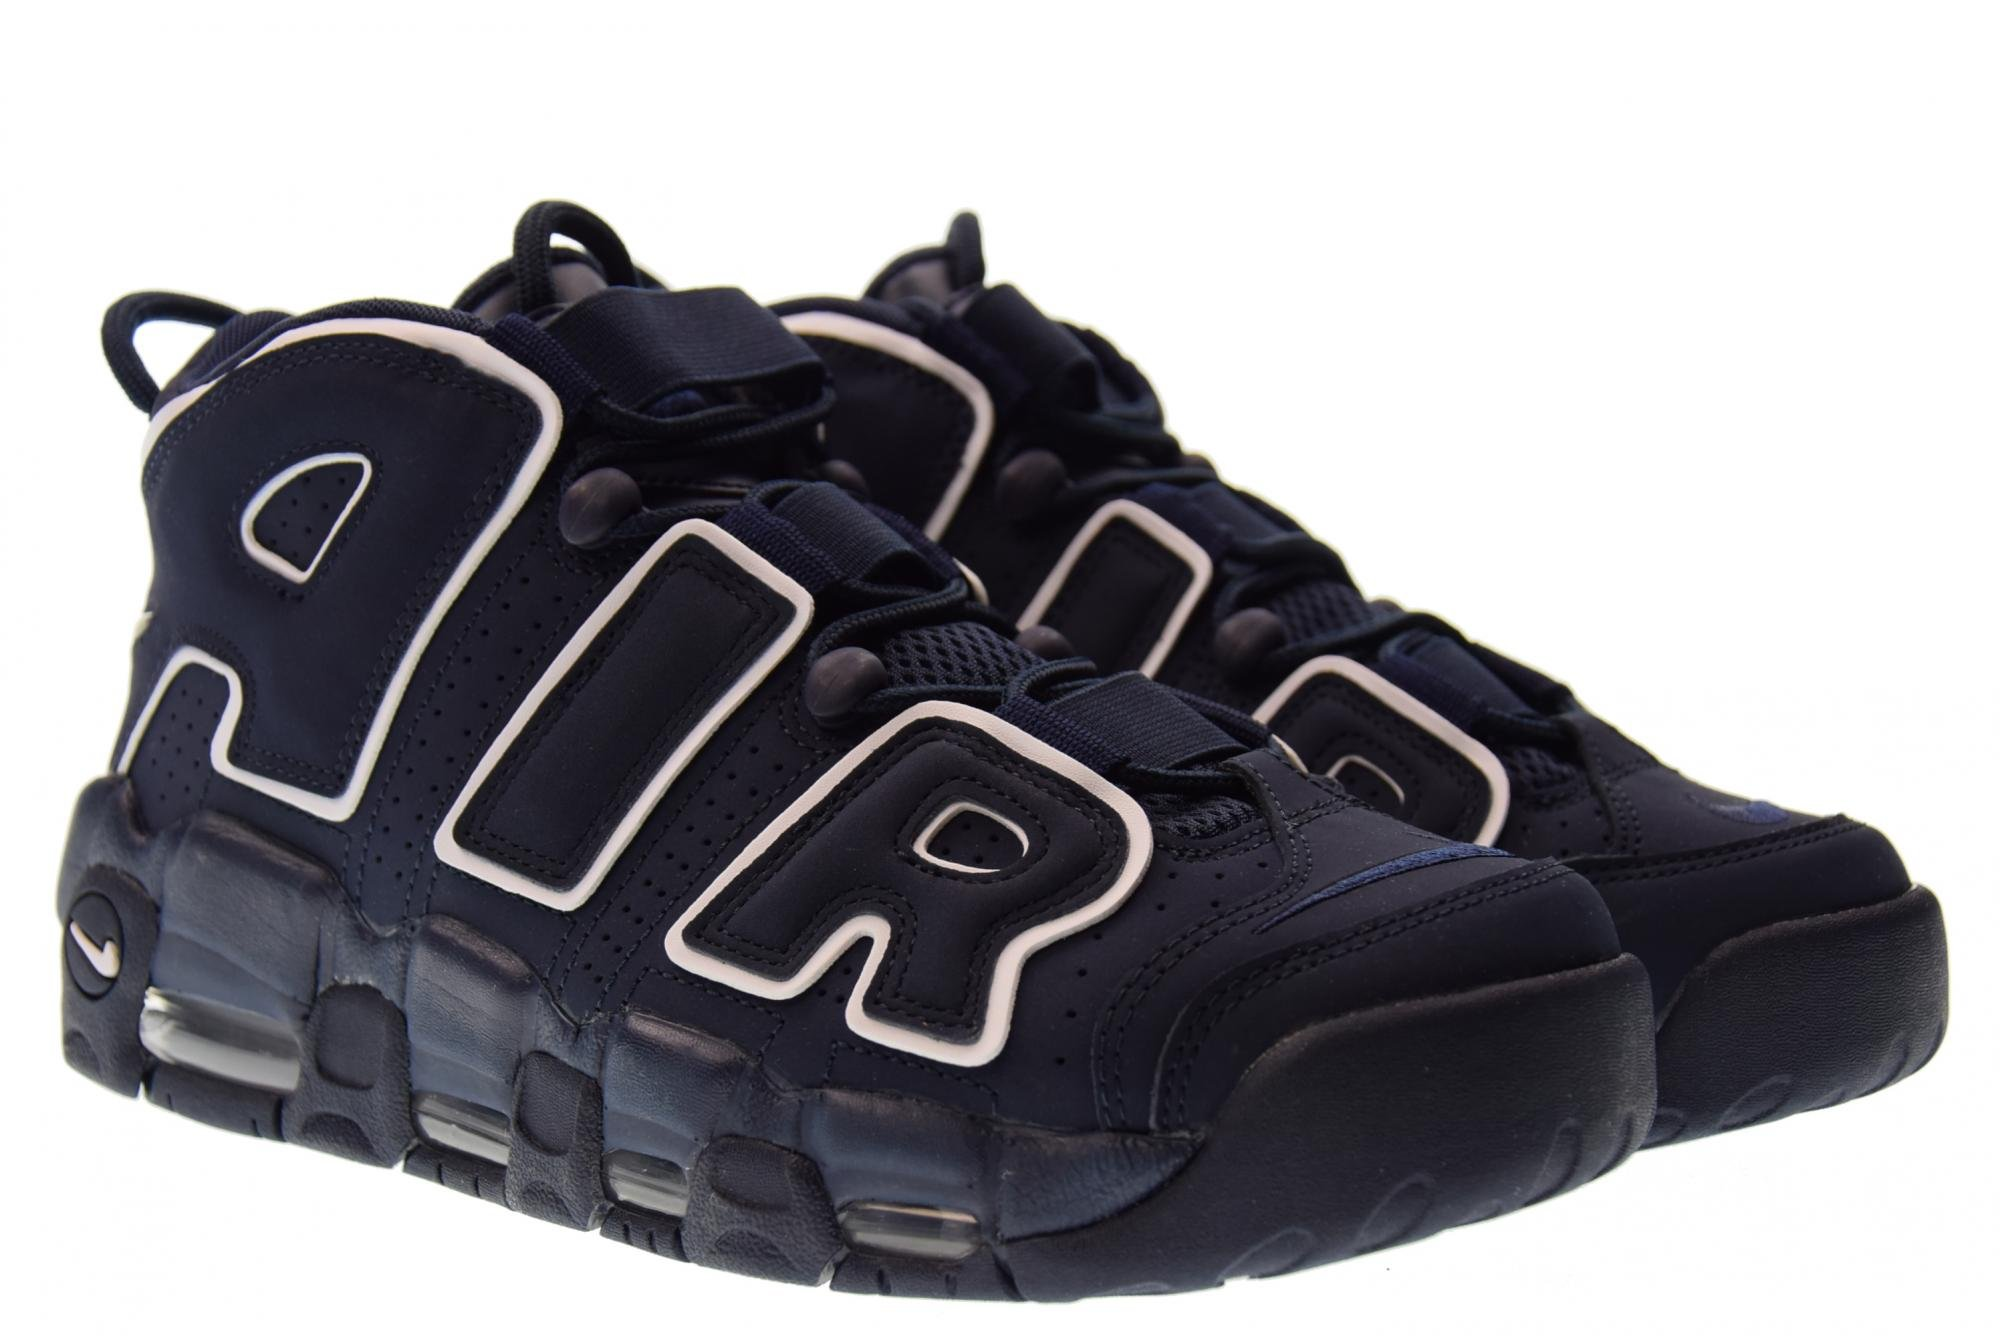 71EmDsa%2BOHL - Nike Men's Air Huarache International Running Shoes